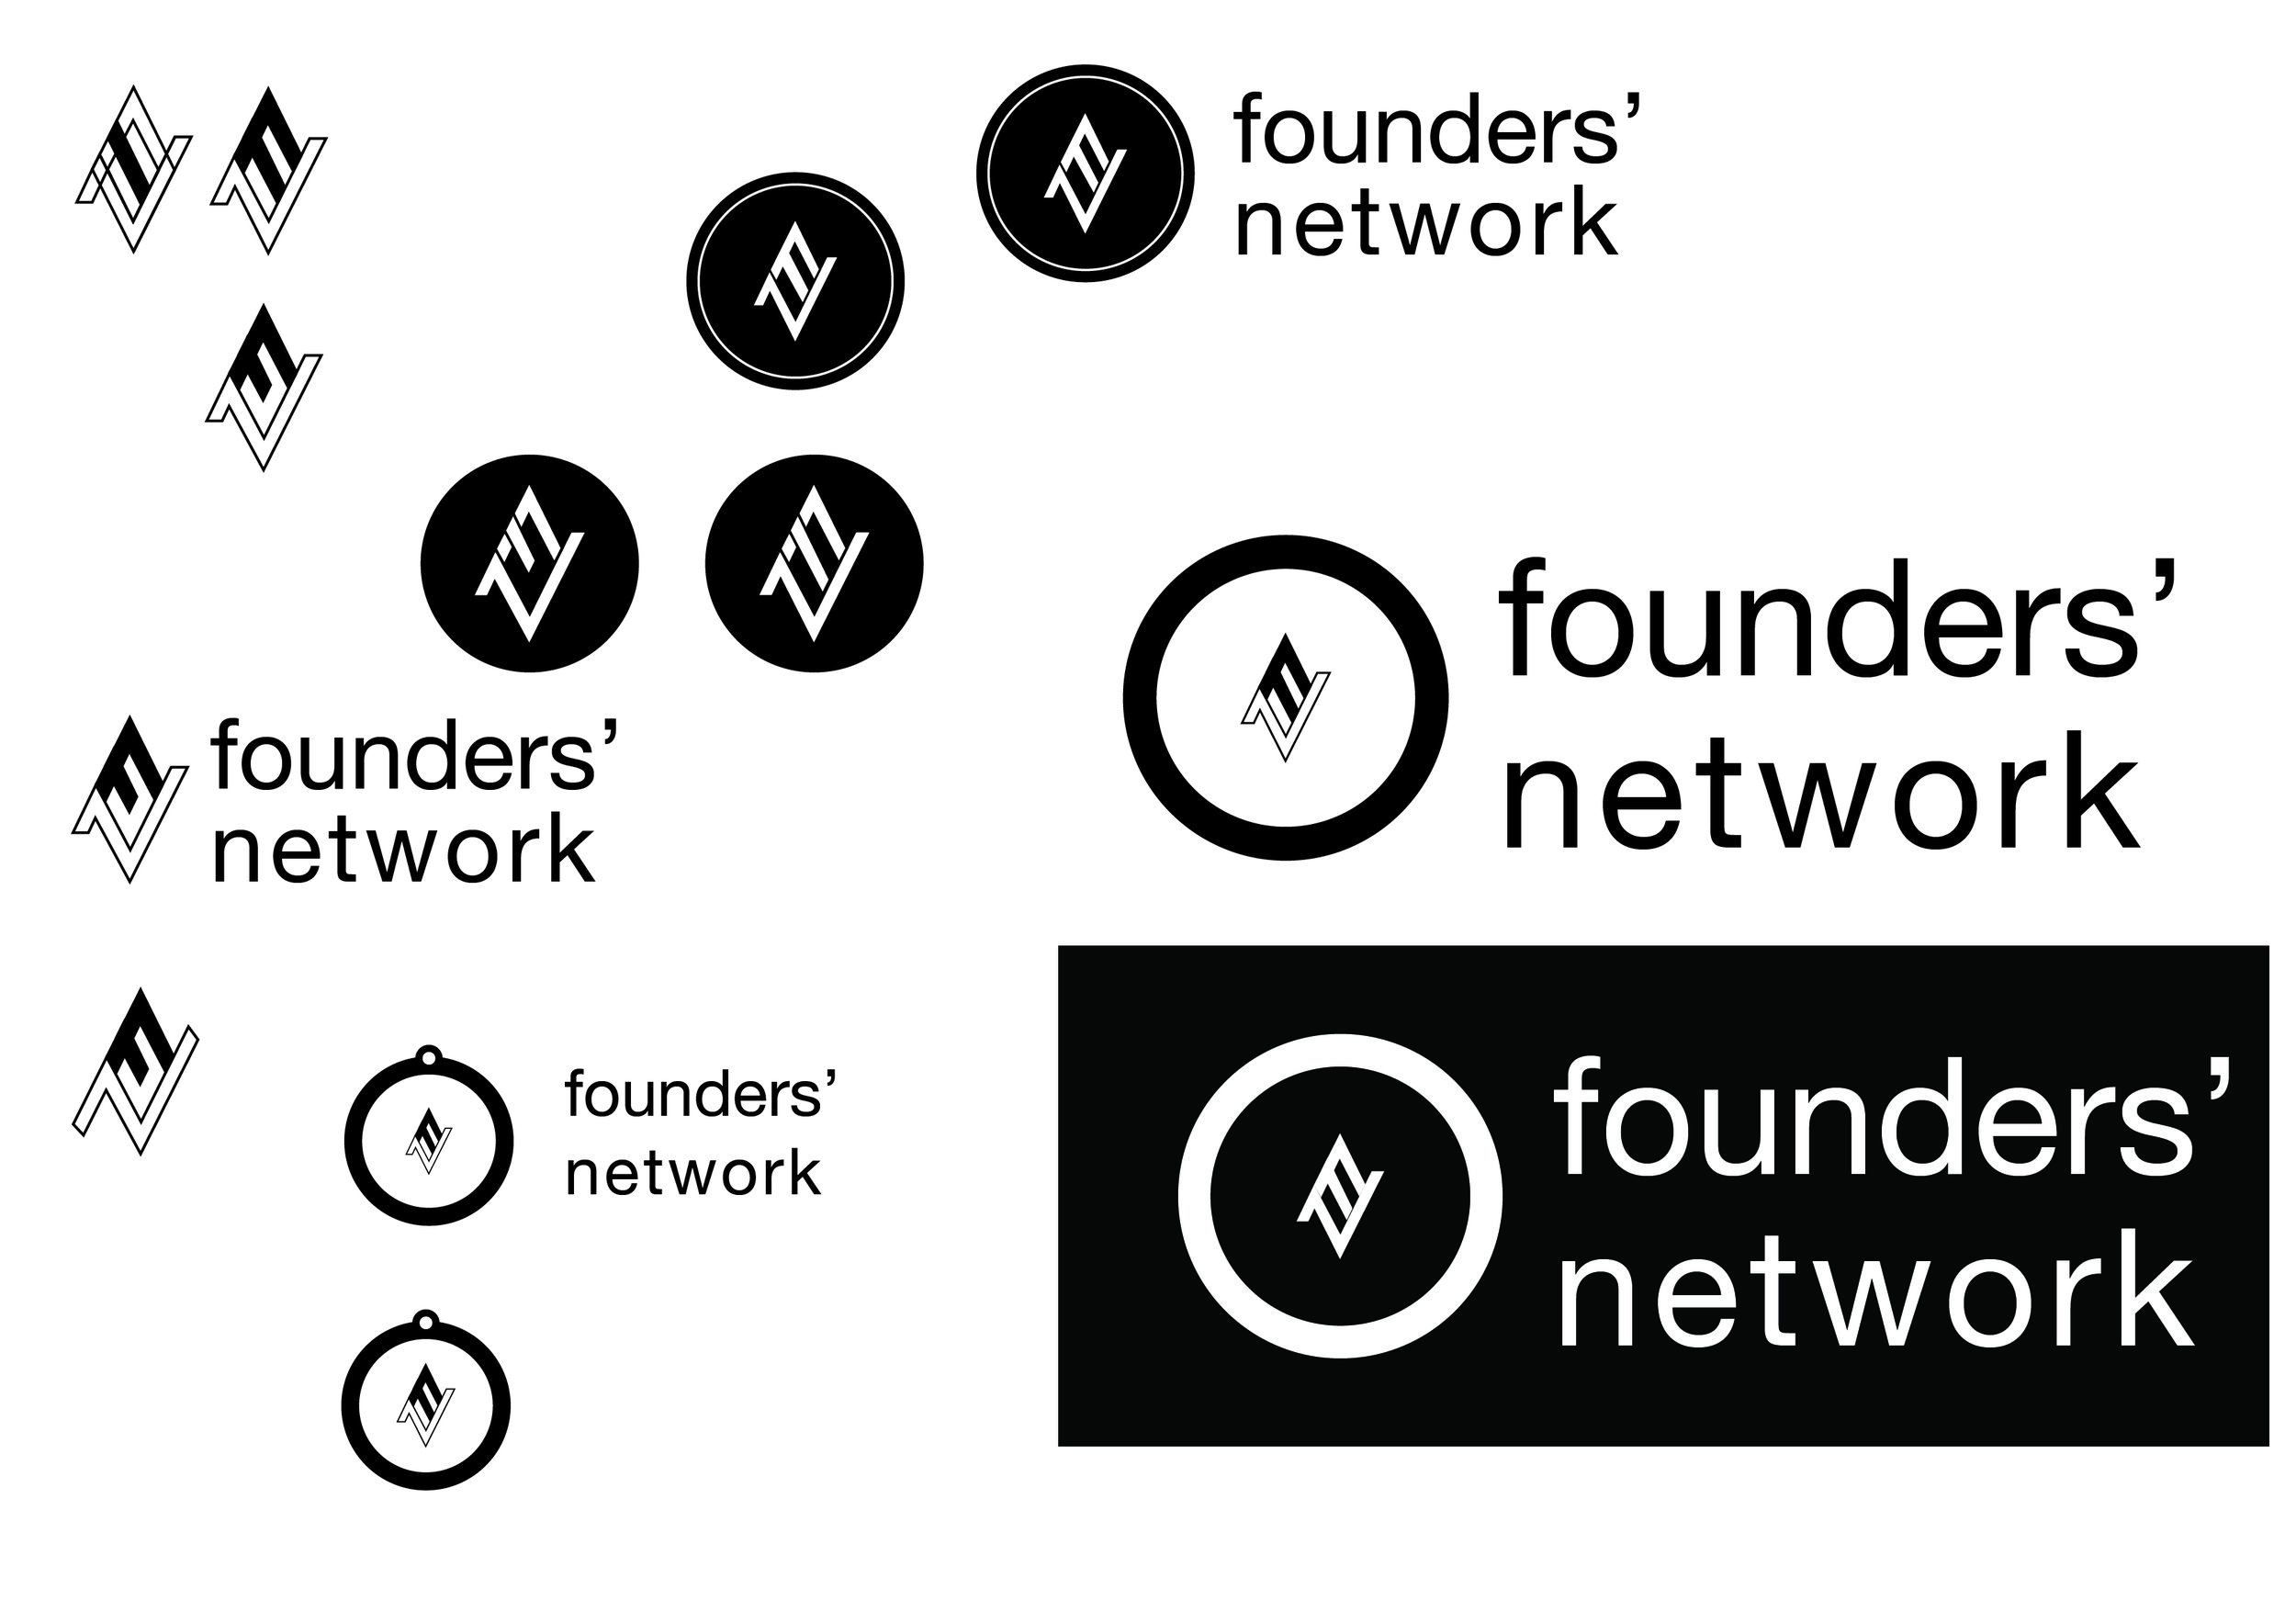 TechNorth-Founders-Network2-01.jpg